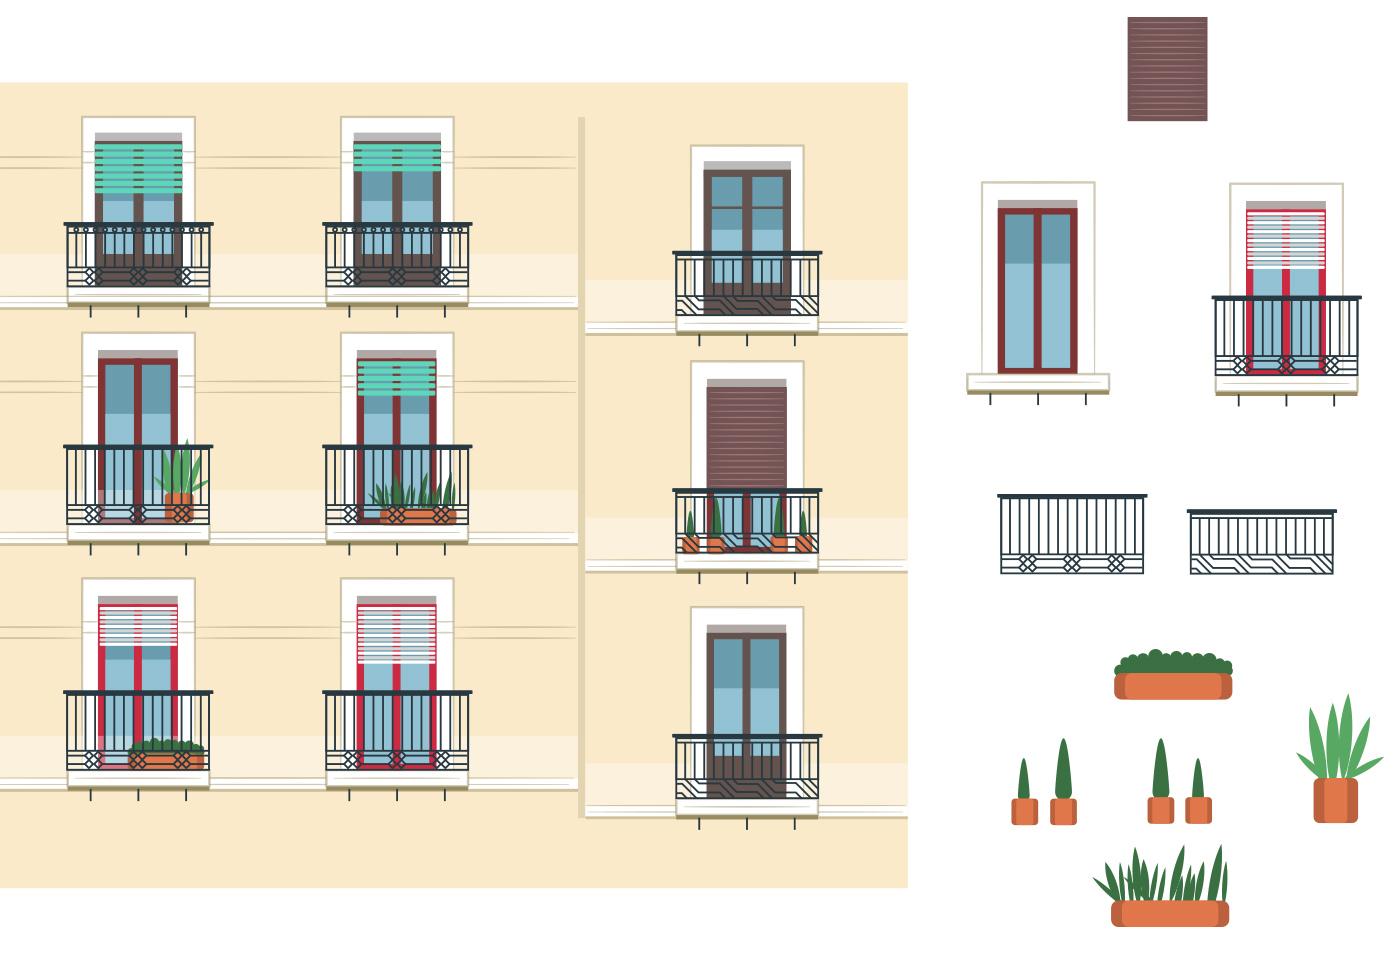 Windows and balcony vectors download free vector art for Balcony vector